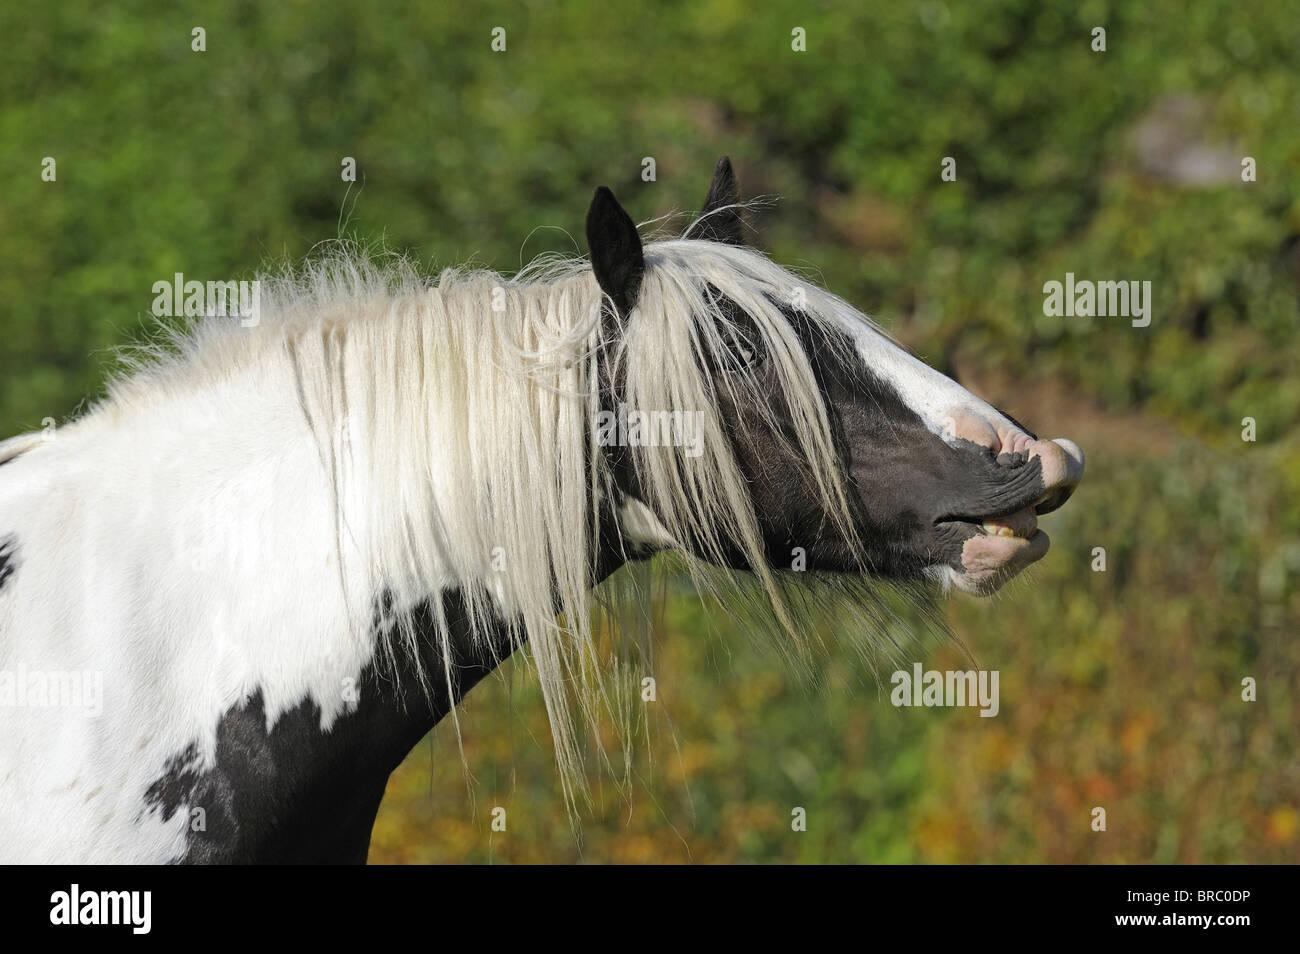 Gypsy Vanner le Cheval (Equus ferus caballus), mare faisant le flehmen. Photo Stock